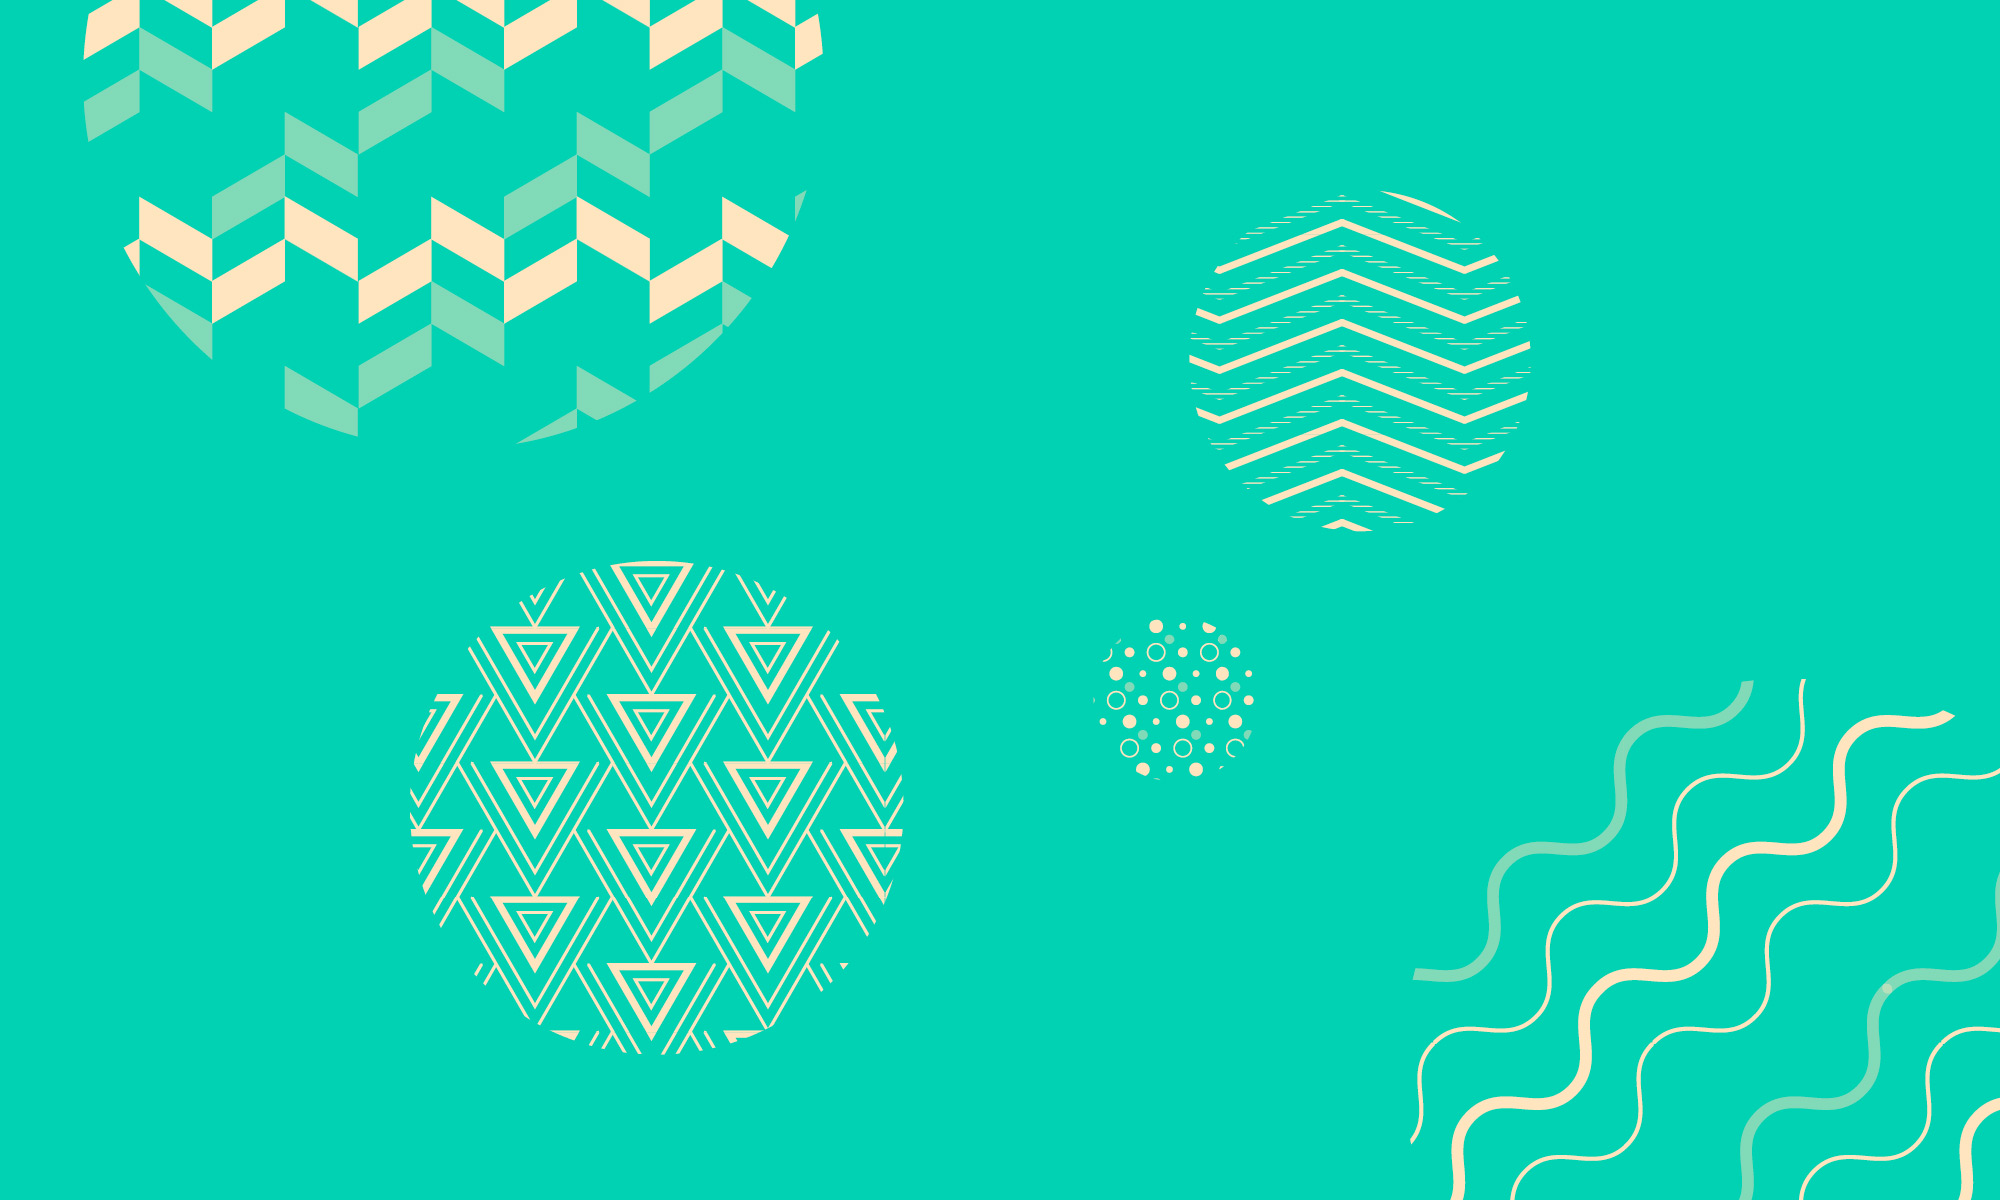 Five Free Patterns